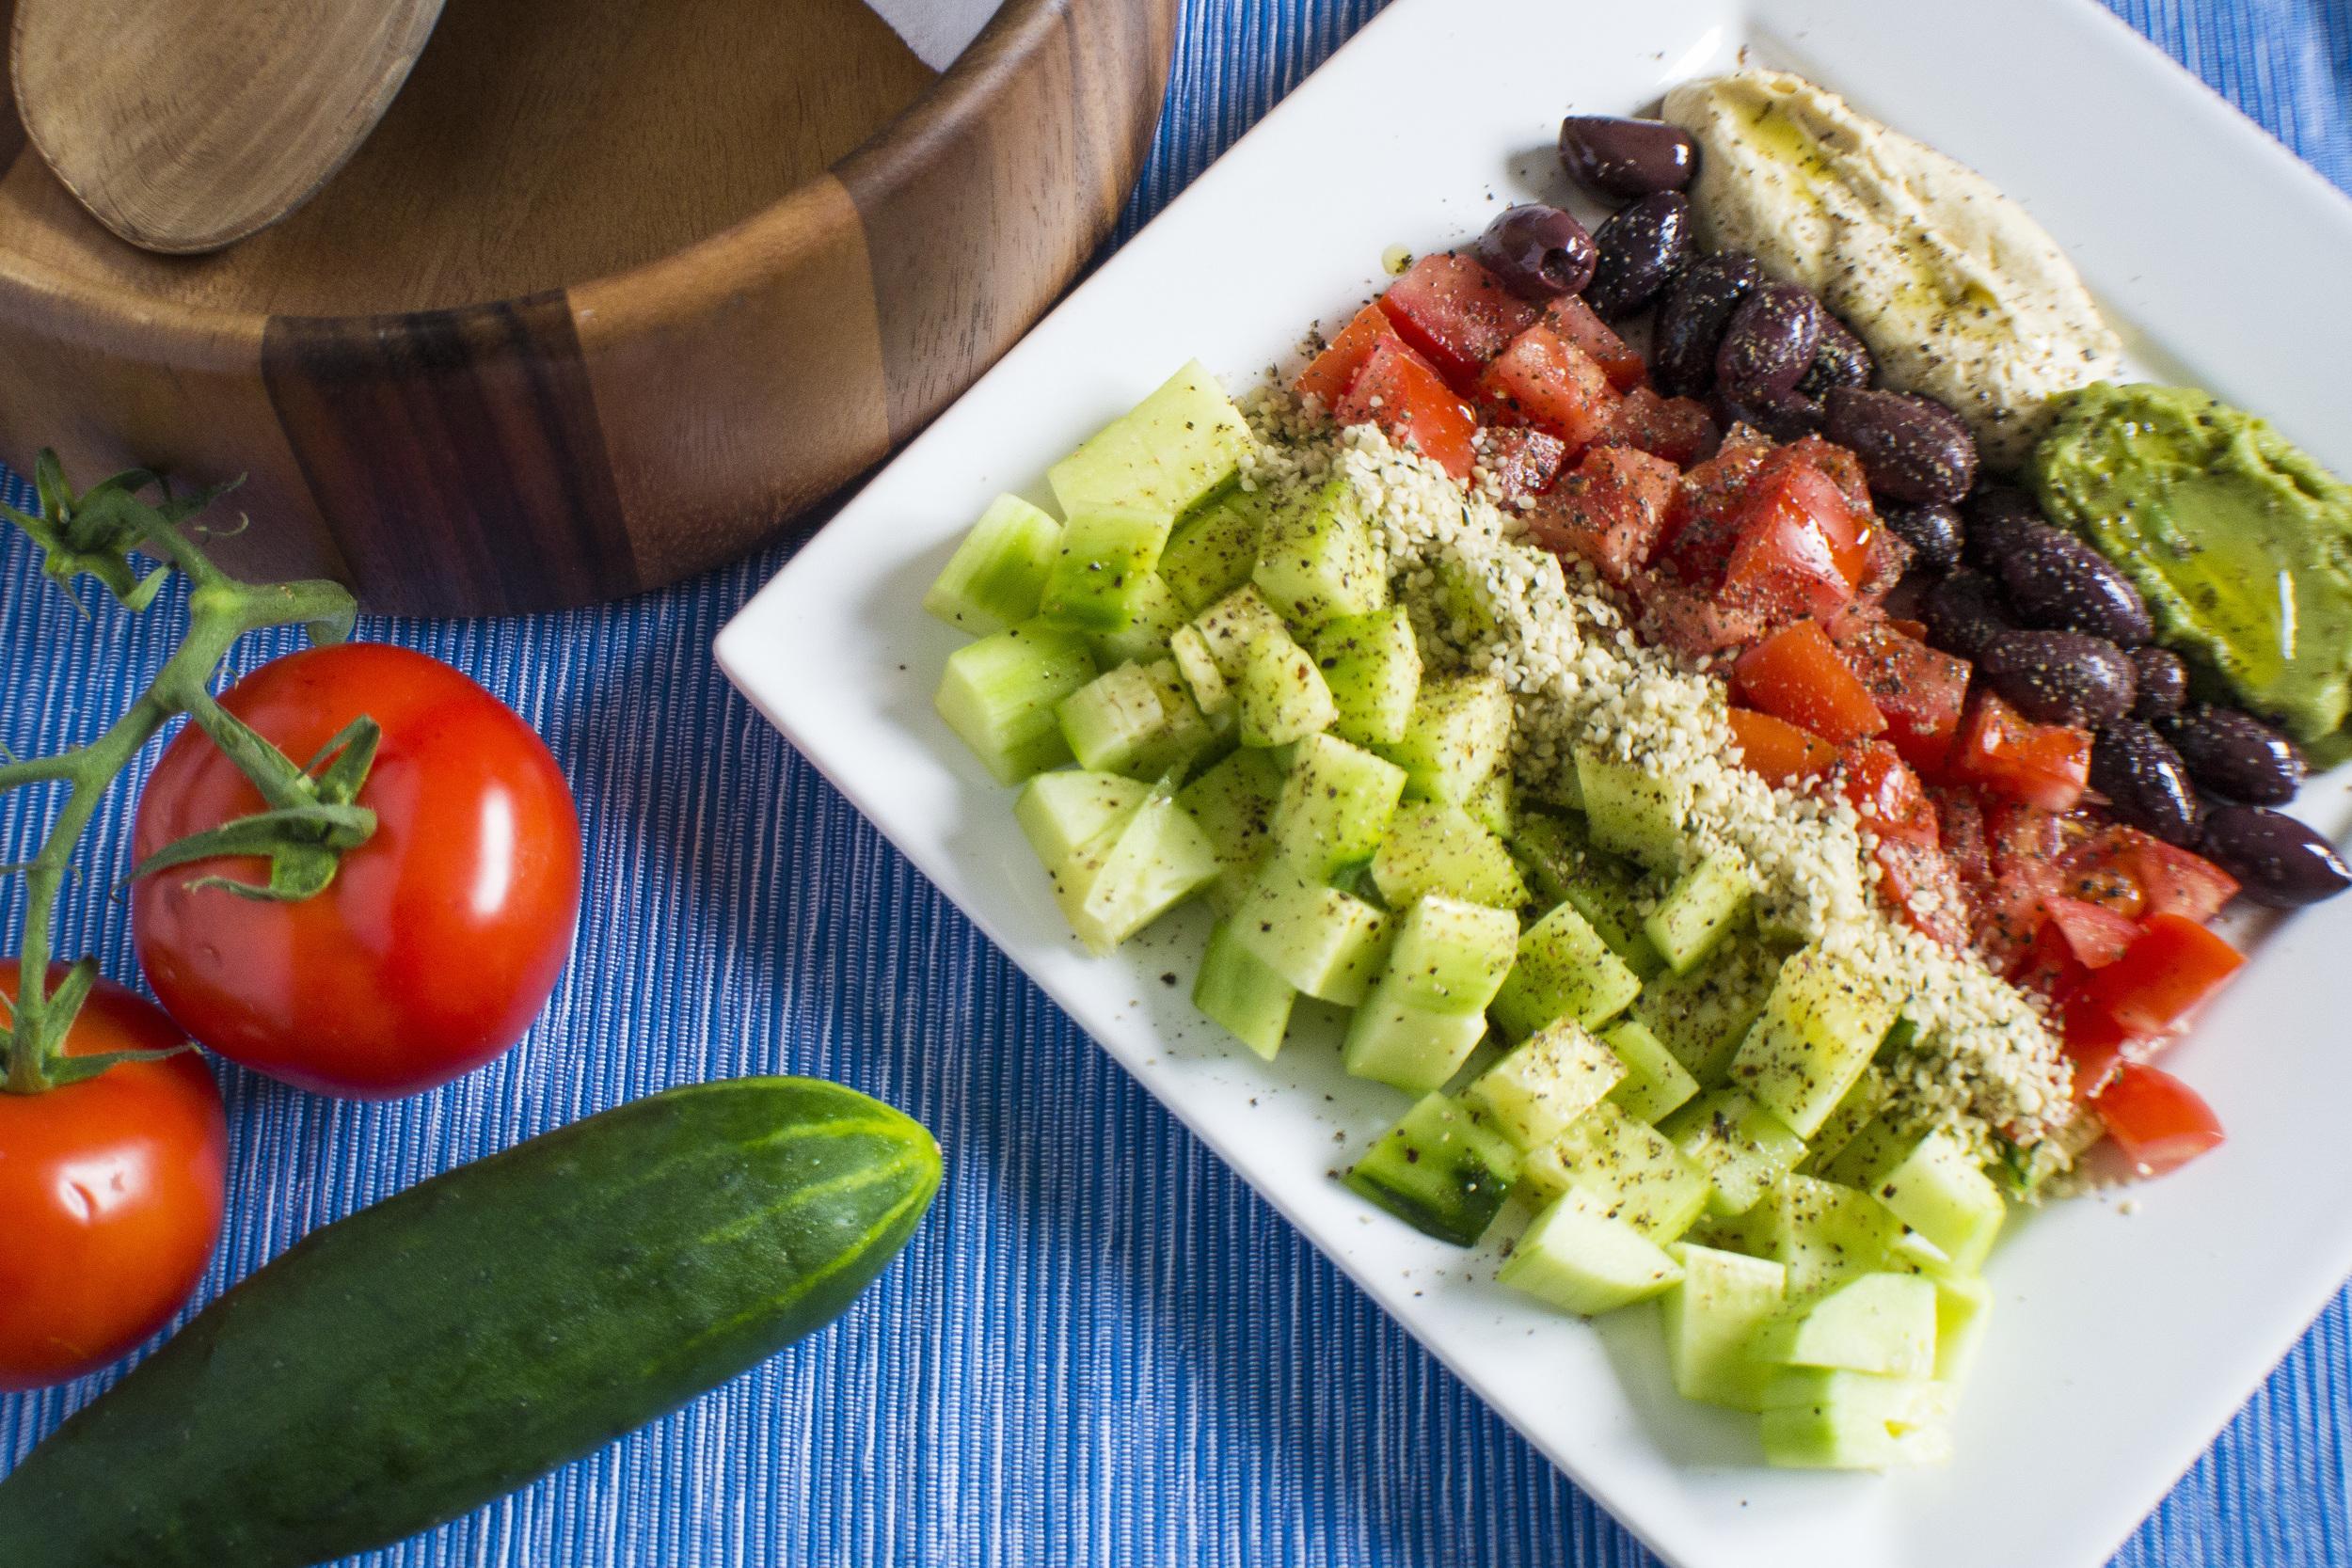 5 Minute Weightloss Salad